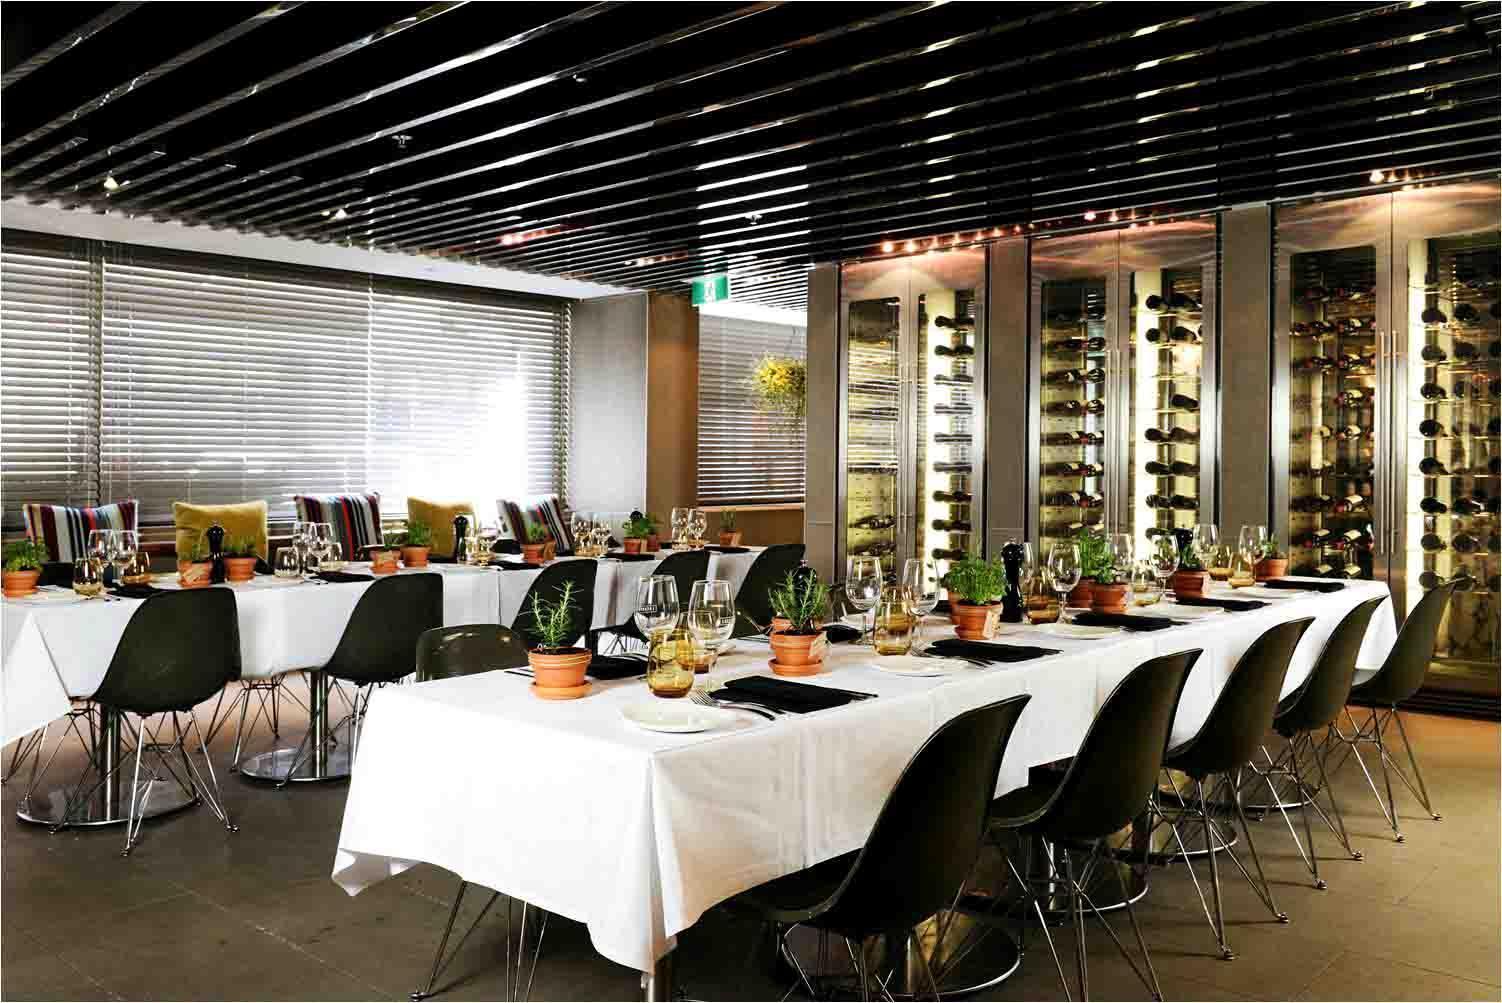 locanda cbd private dining venue hidden city secrets